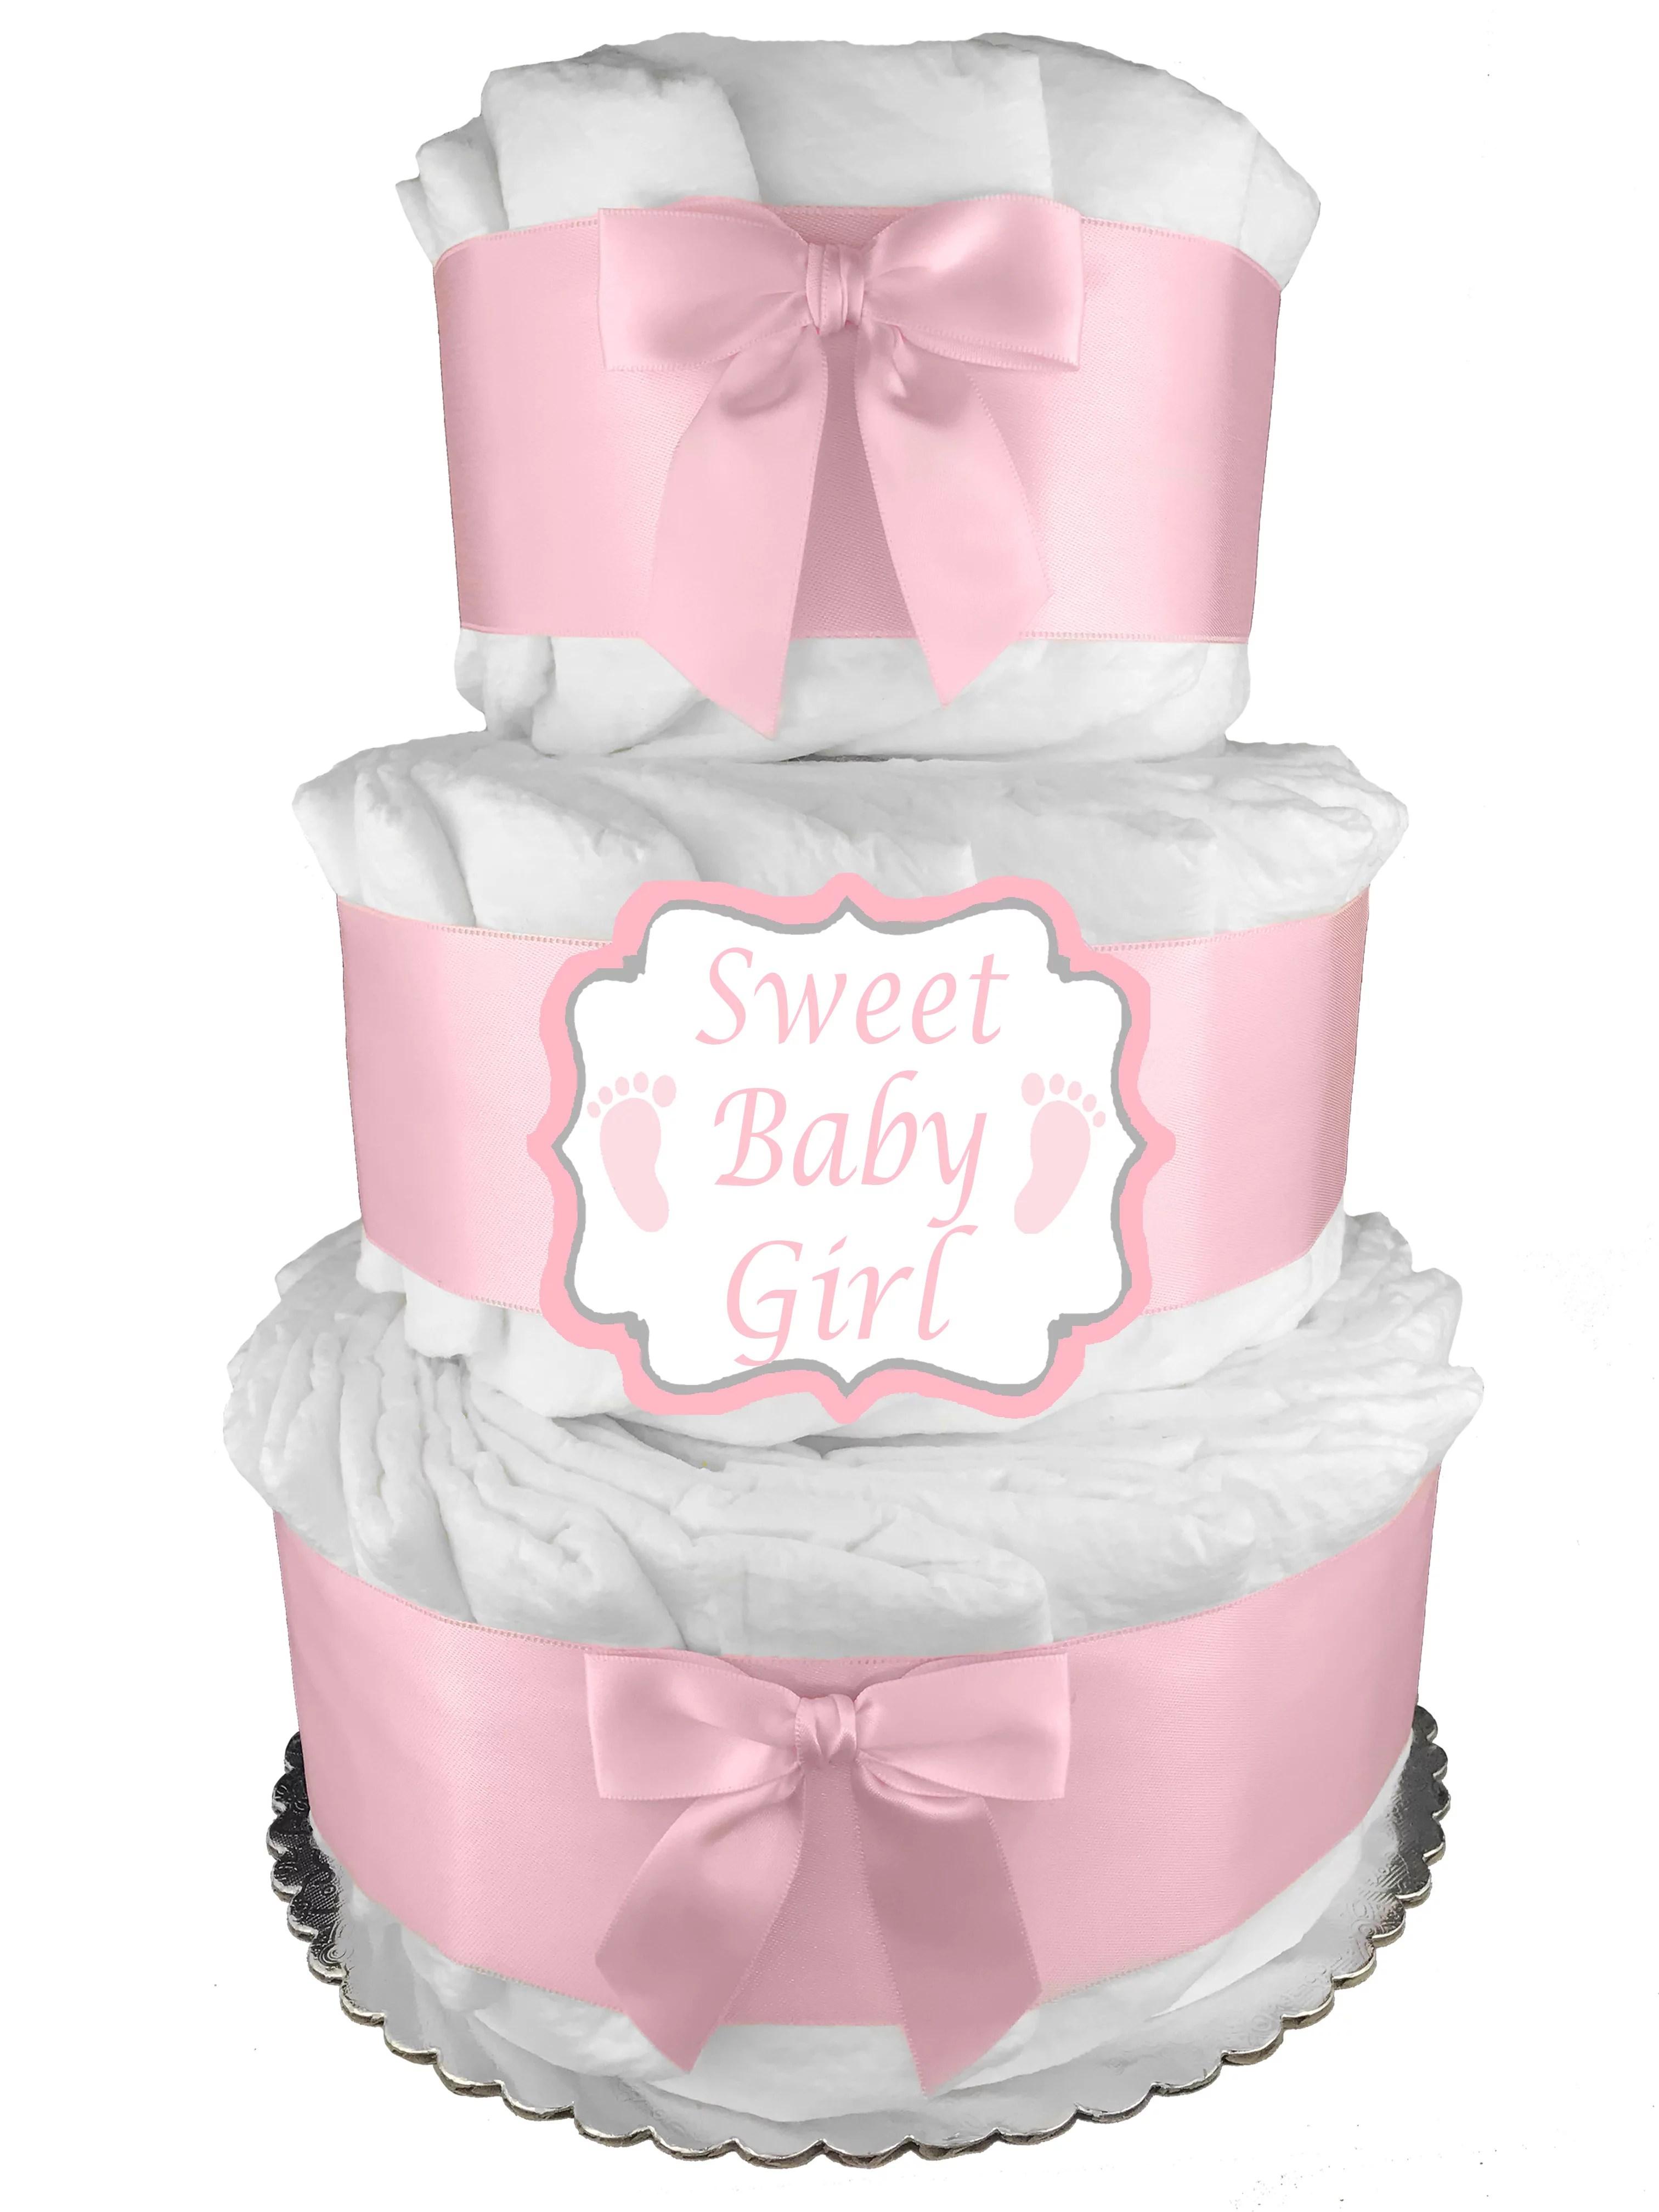 Baby Shower Cakes At Walmart : shower, cakes, walmart, 3-Tier, Diaper, Shower, Newborn, Walmart.com